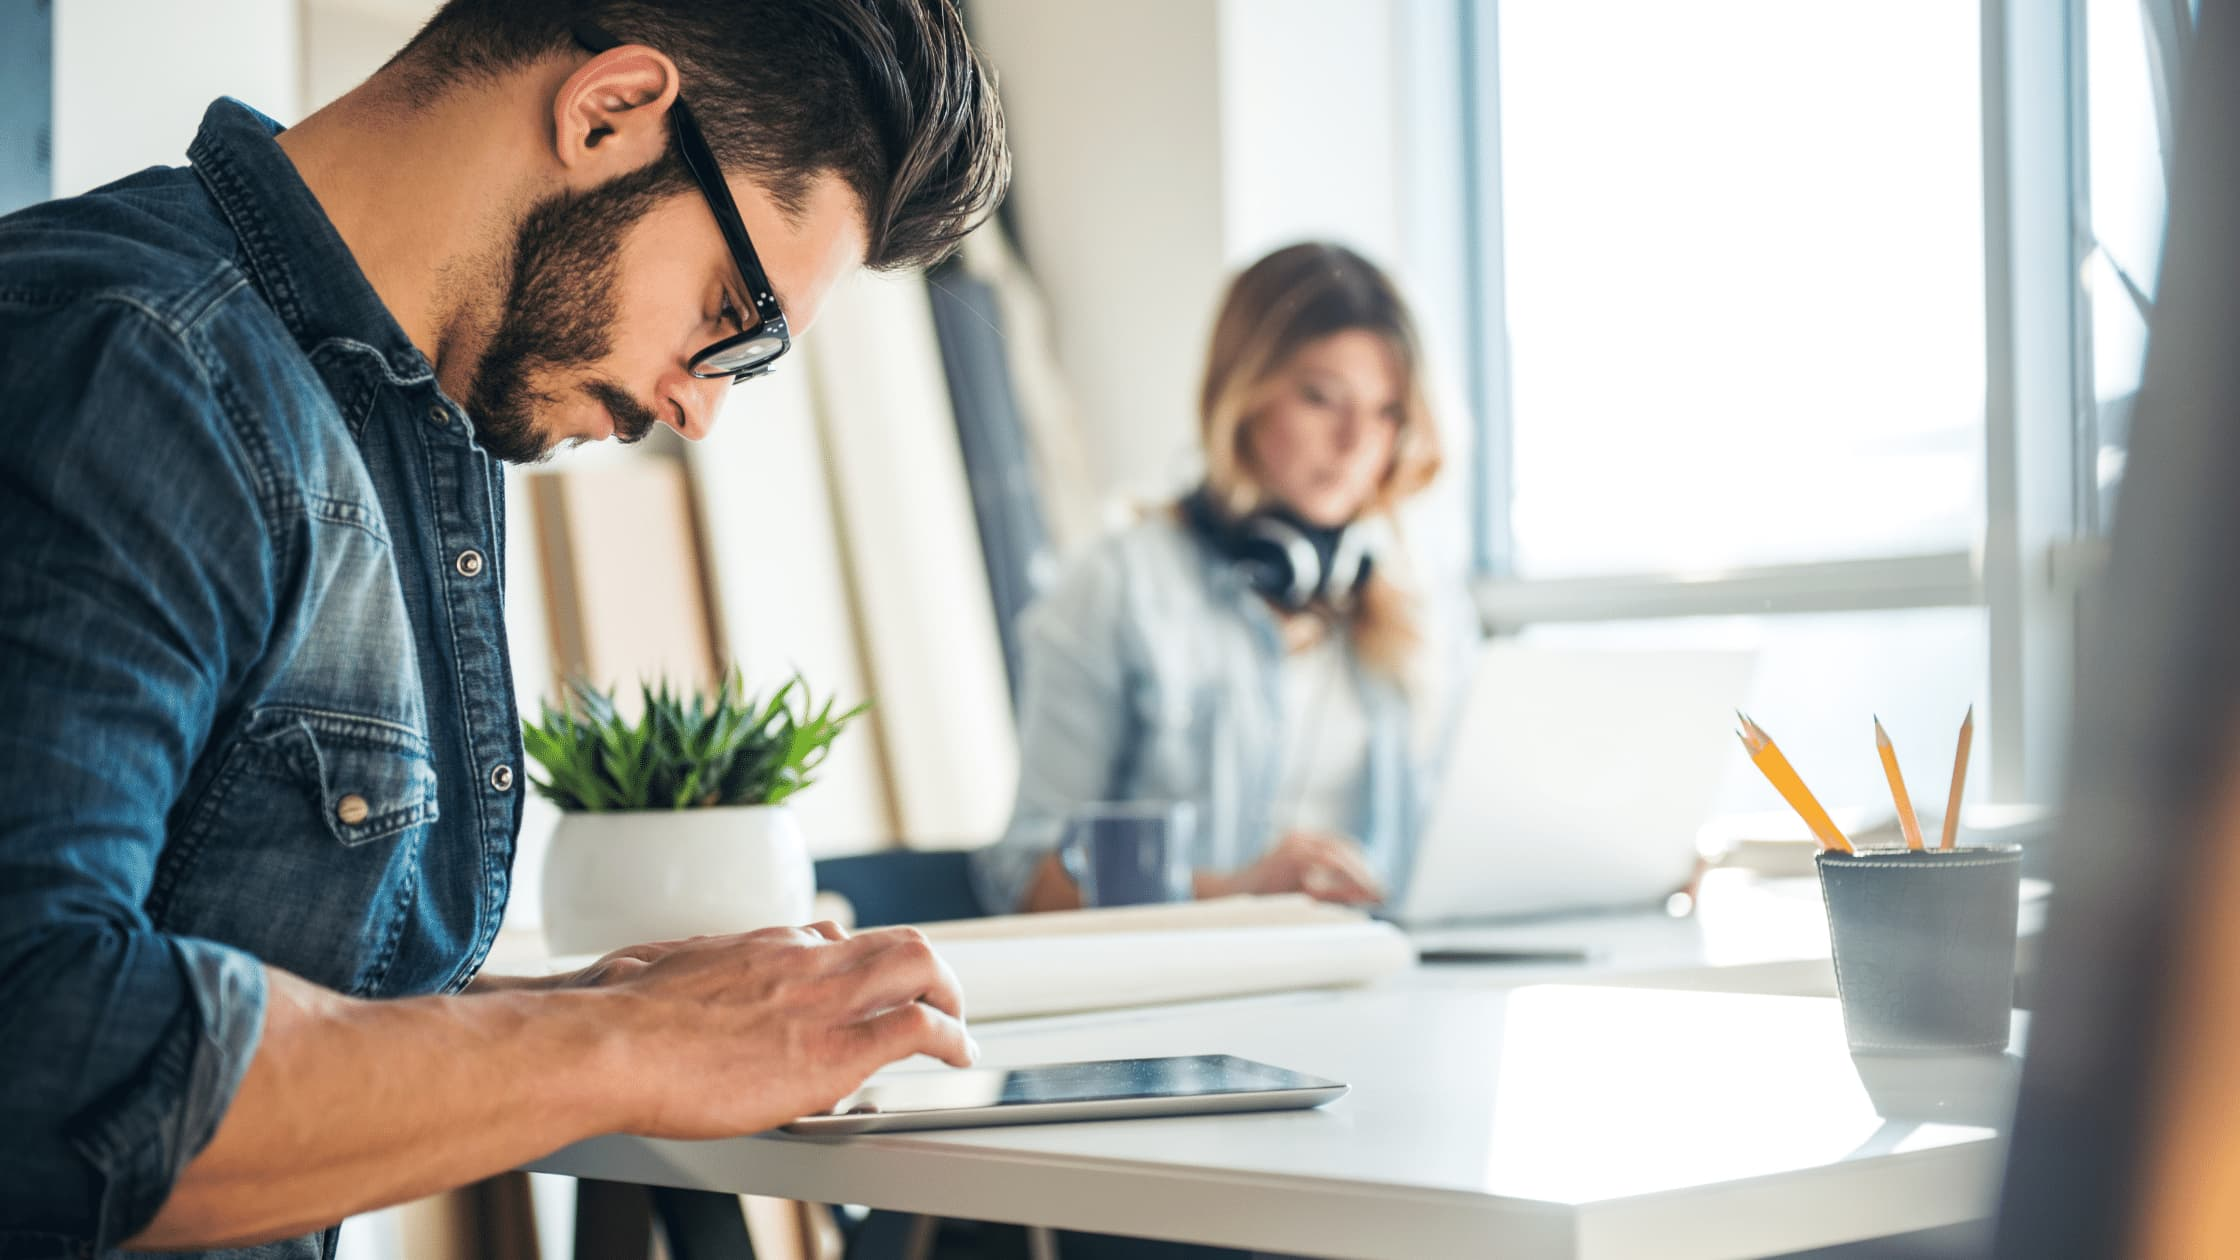 EBOOK:5 Tools That Improve A Mixed Work Environment